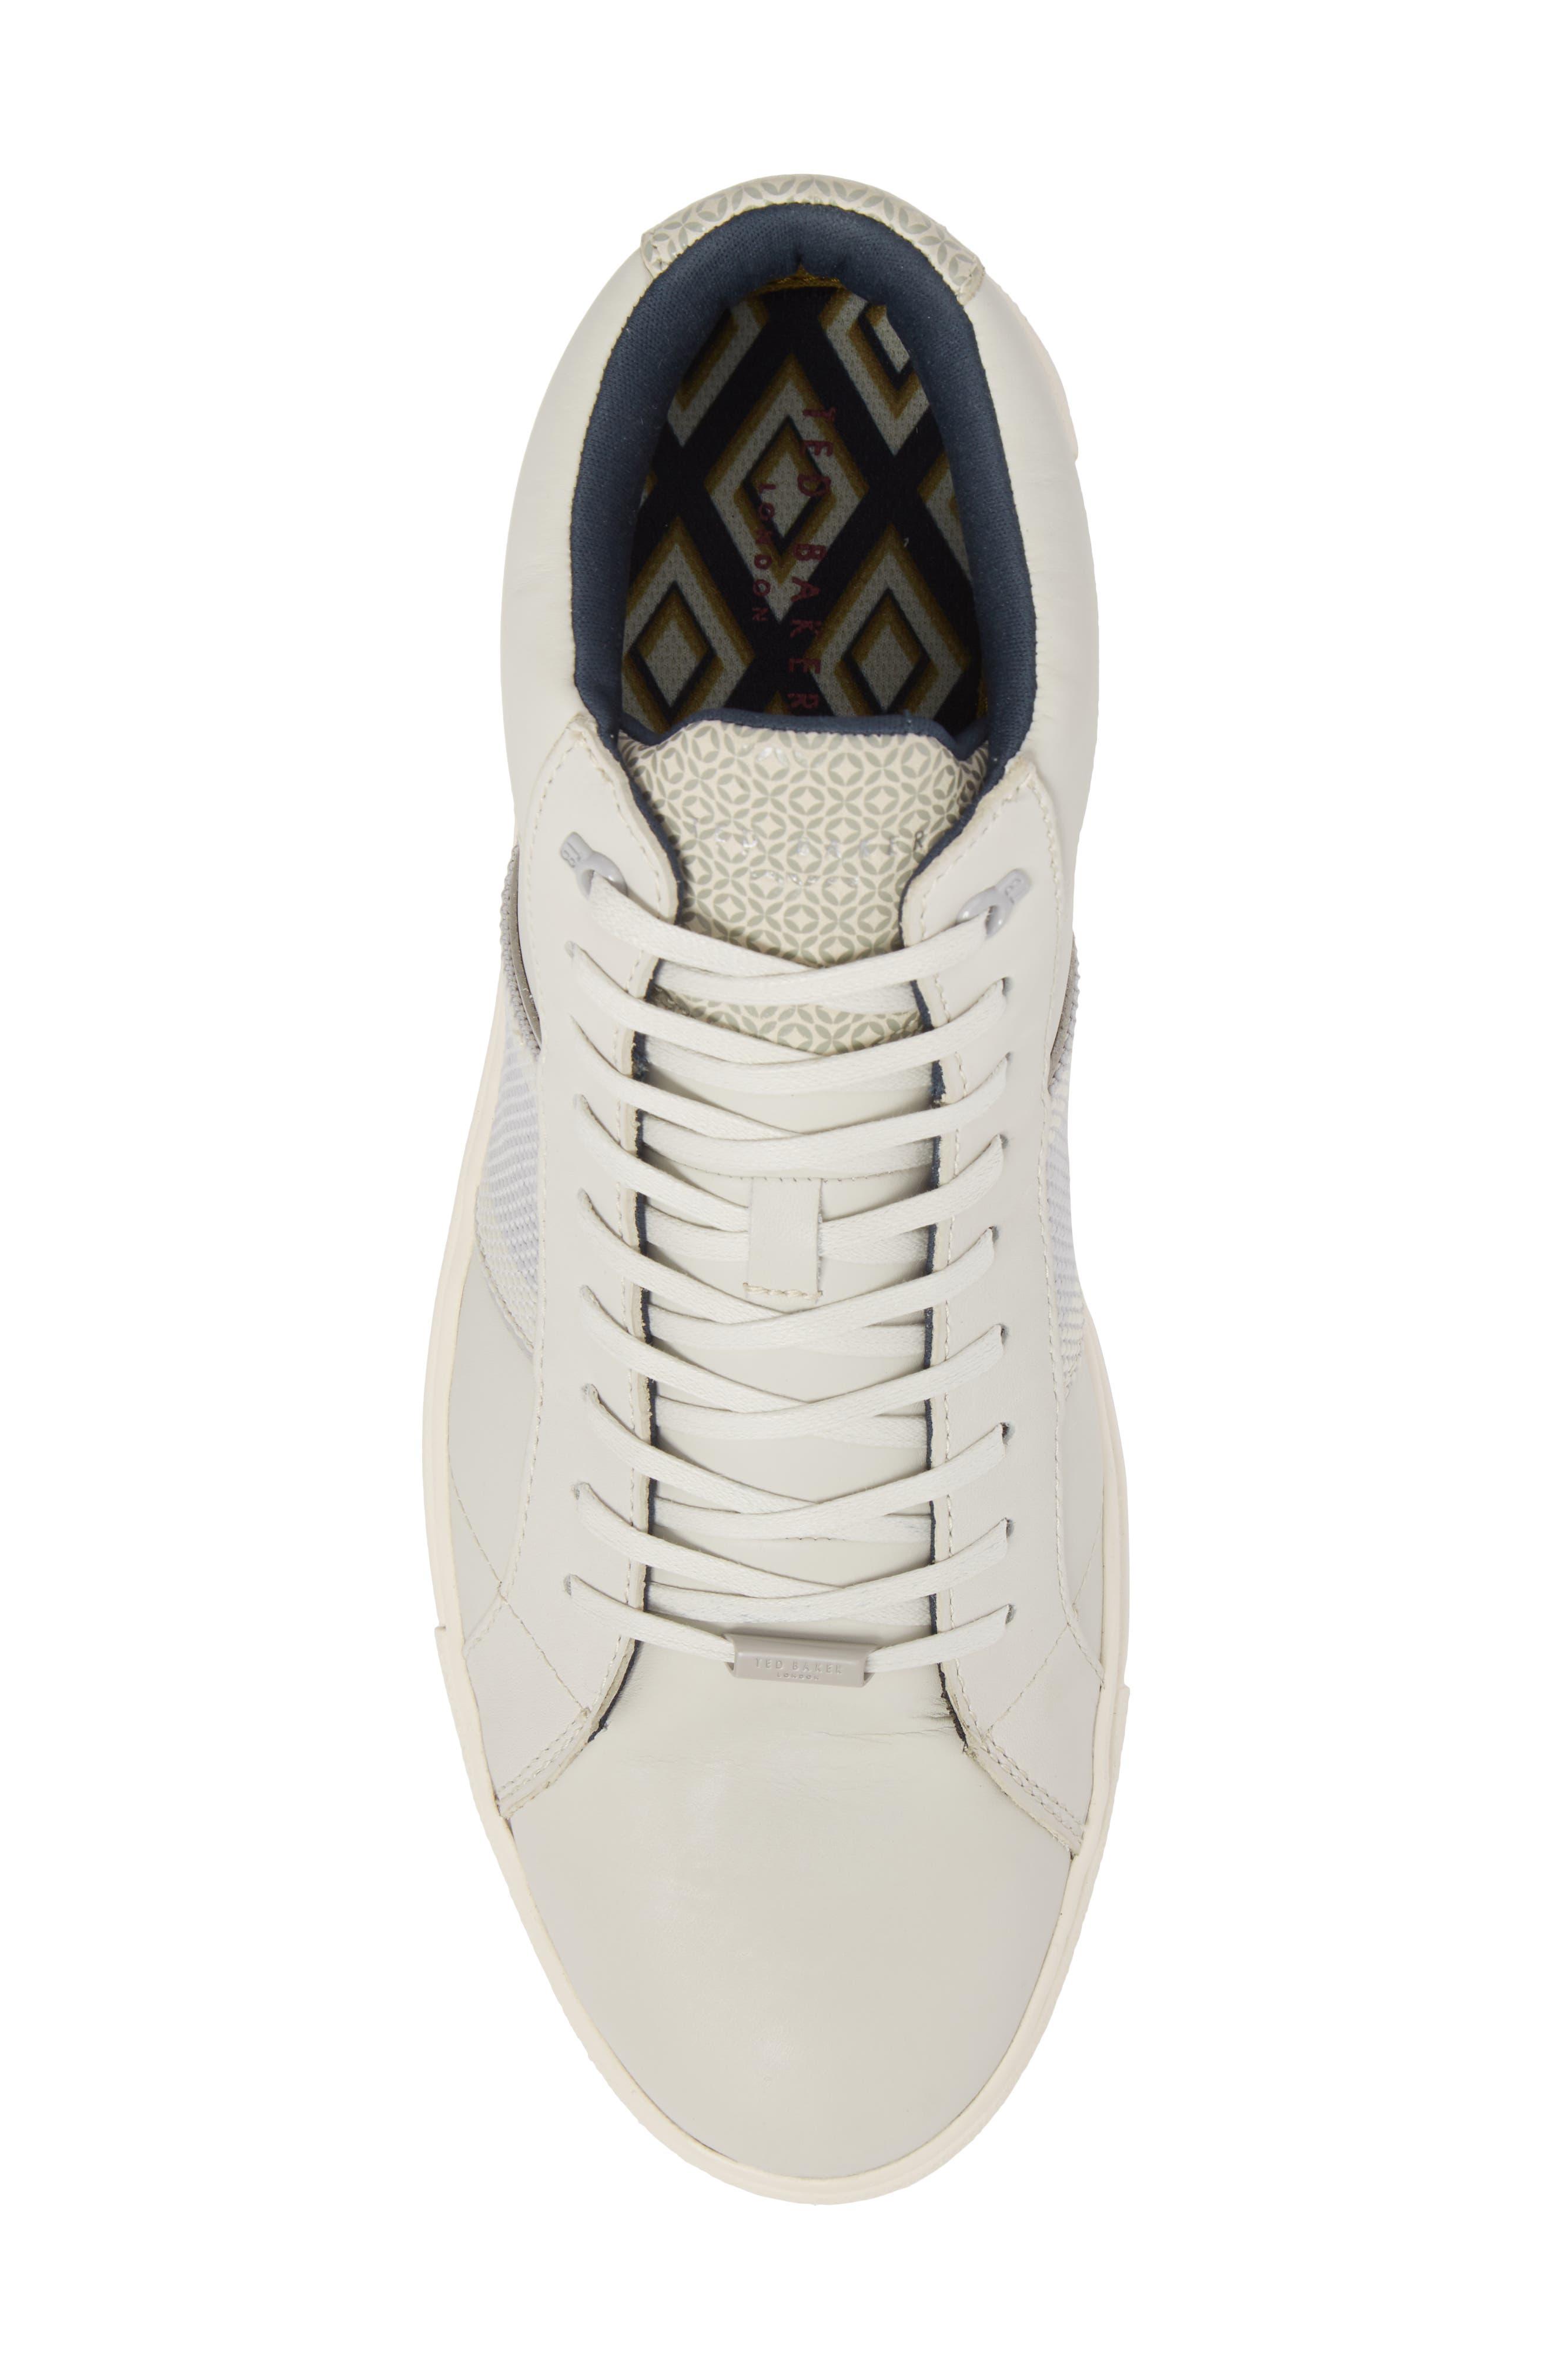 Cruuw High Top Sneaker,                             Alternate thumbnail 5, color,                             152